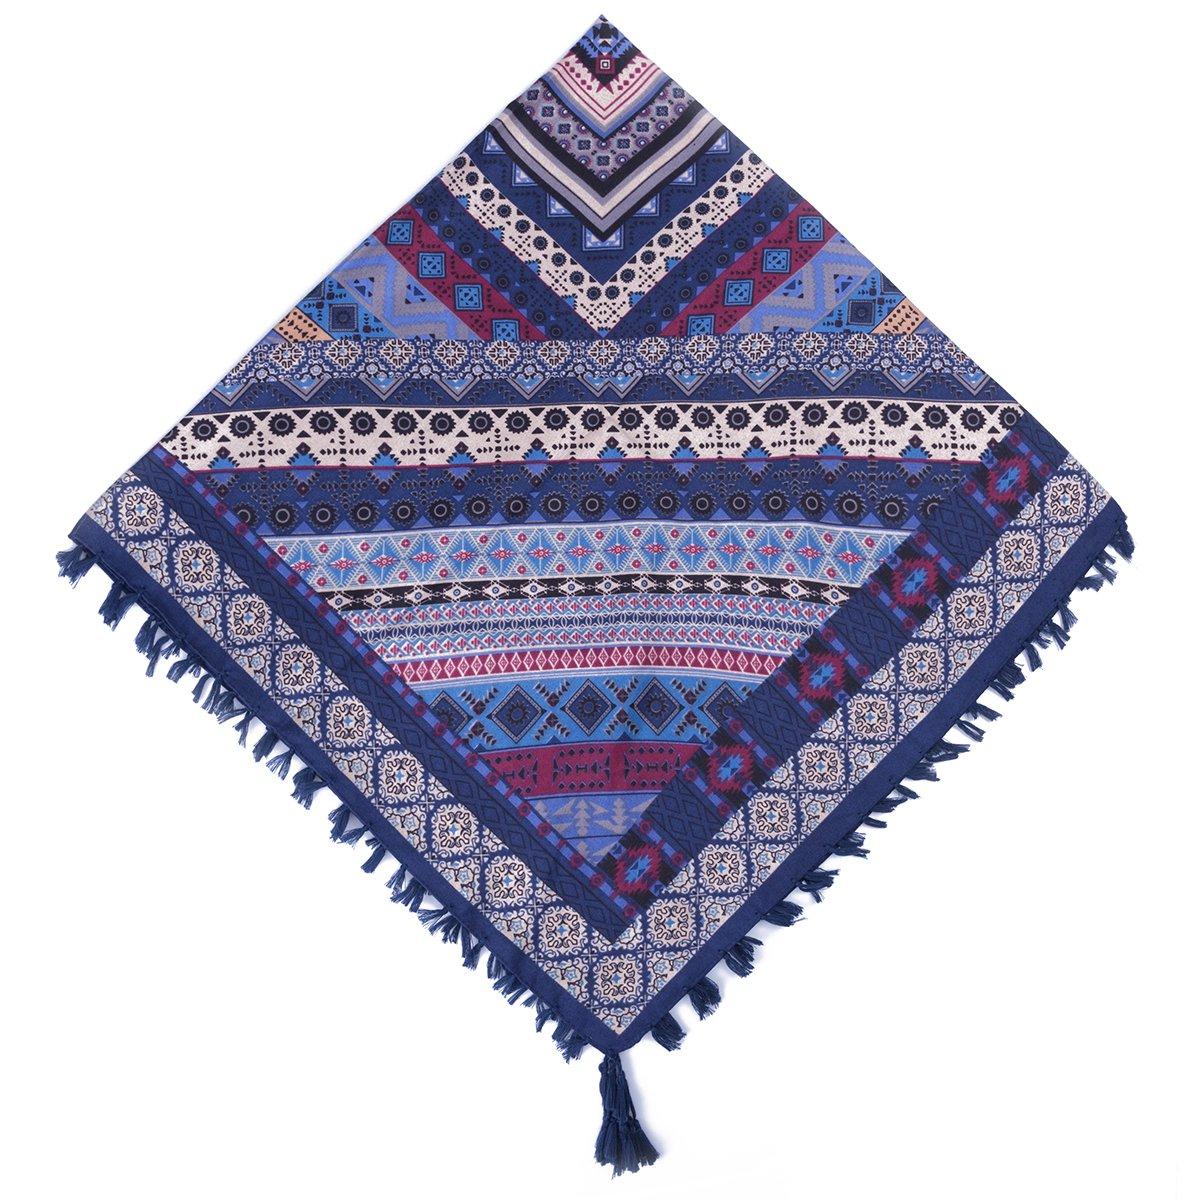 EVRFELAN Women Boho Scarf Tassel Shawl Tapestry Tablecloth Beach Towel Picnic Throw Wall Hanging Yoga Mat Ladies Cotton Scarves by Popular Handicrafts (Blue2)